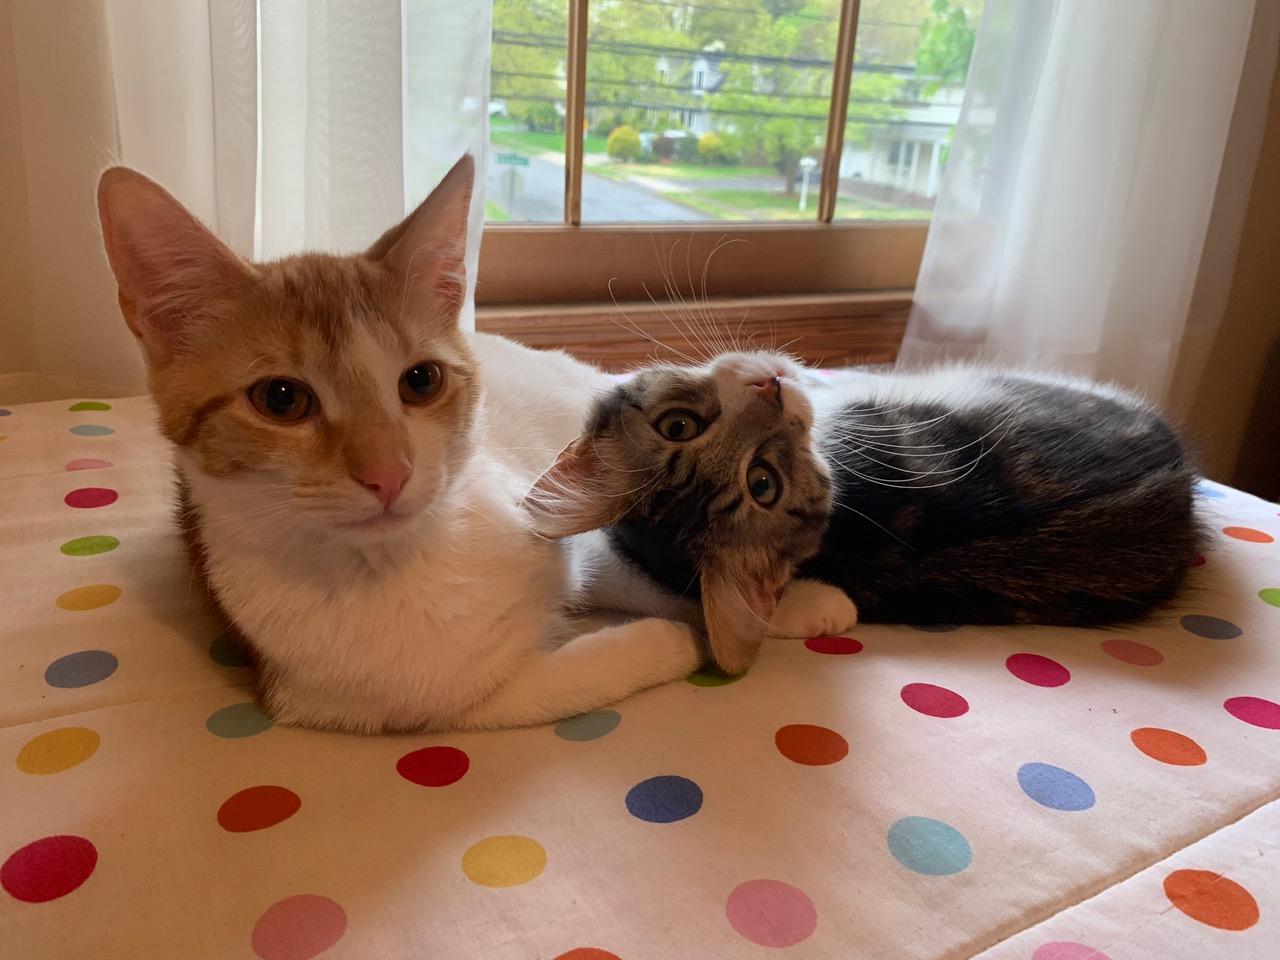 Skye & Buddy (aka Tigger)